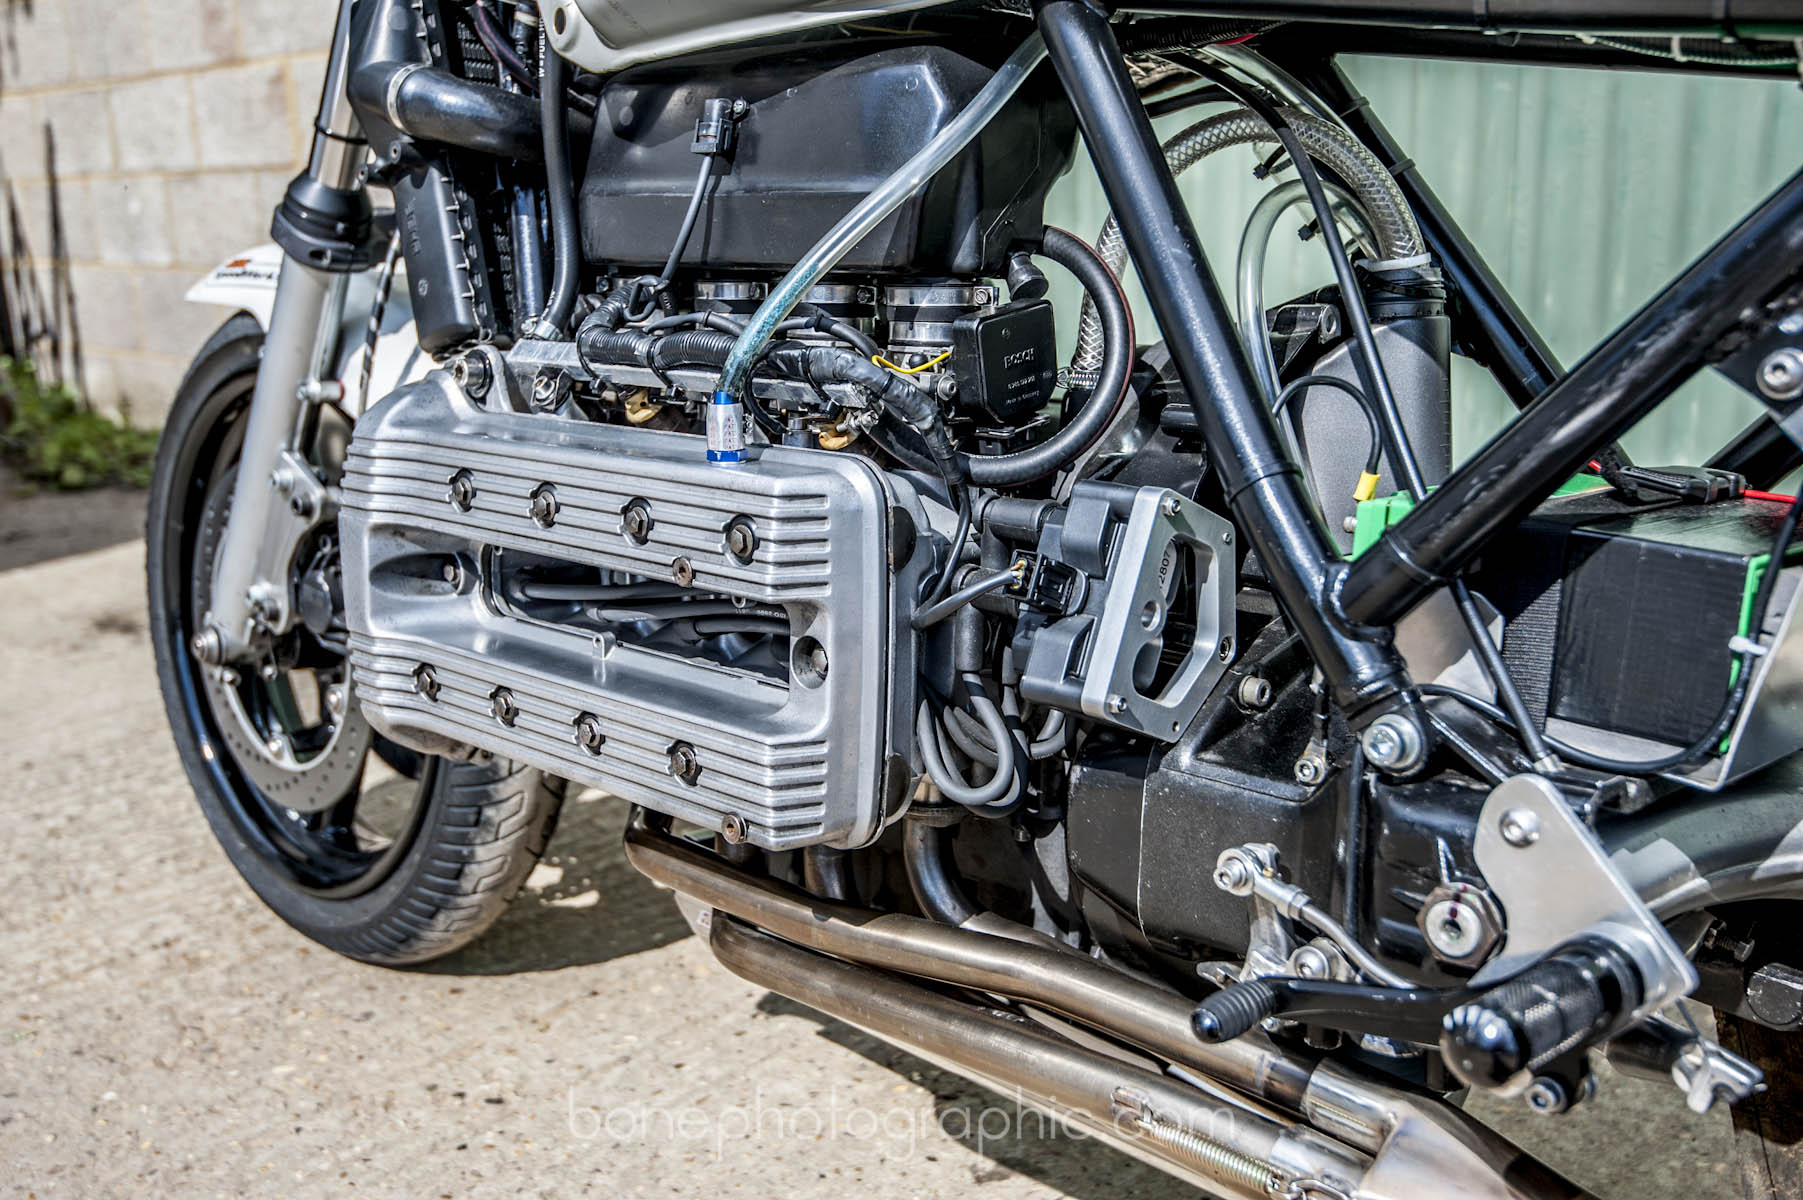 Fuel filter routine replacement - necessary? BSK_Speedworks_k100_racer_90